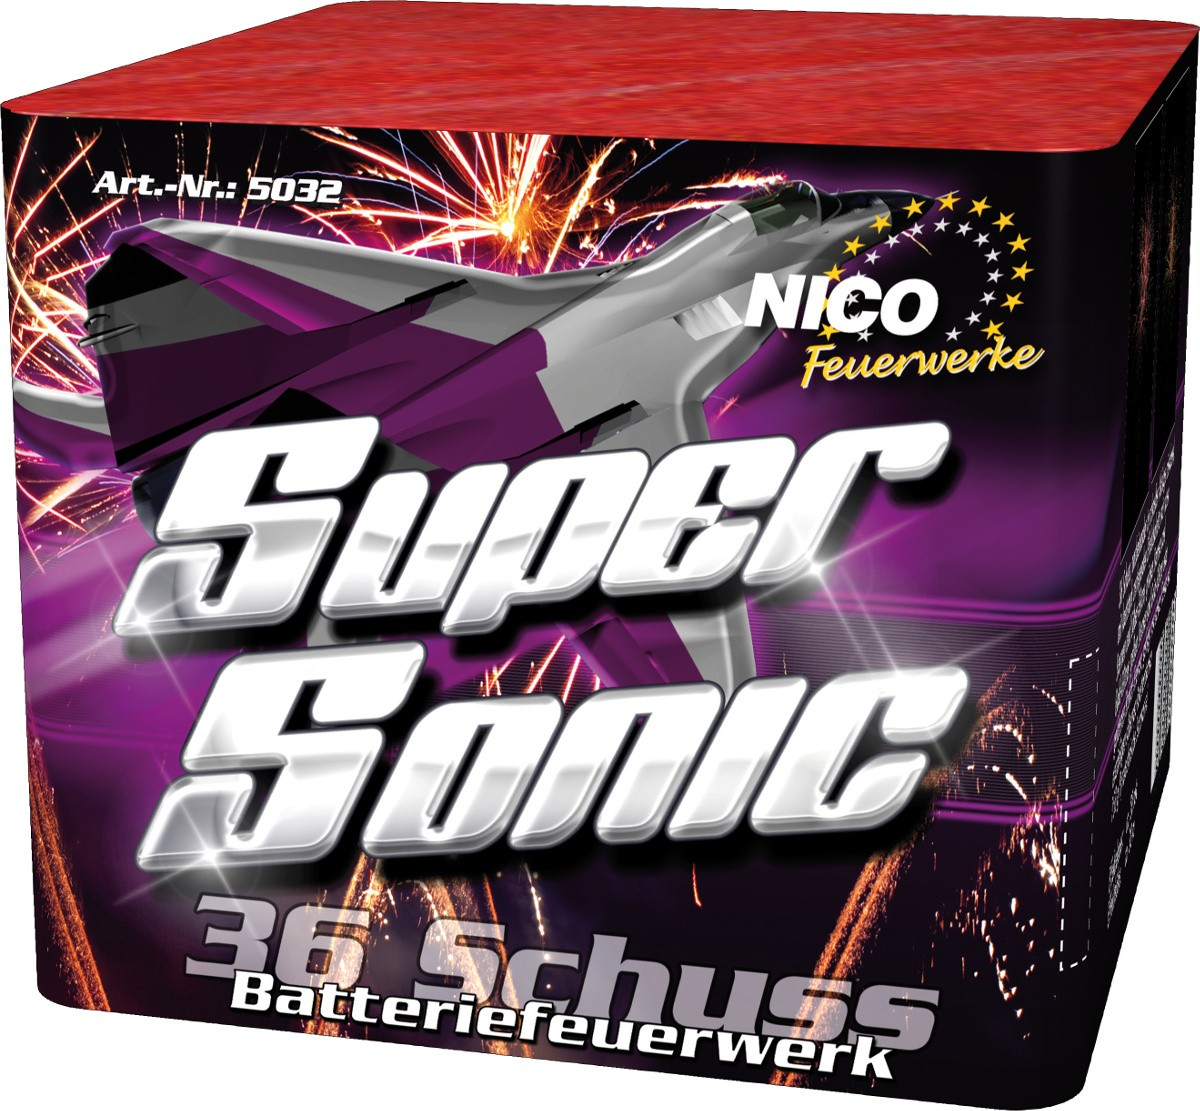 Batterie Super Sonic Feuerwerk 36 Schuss